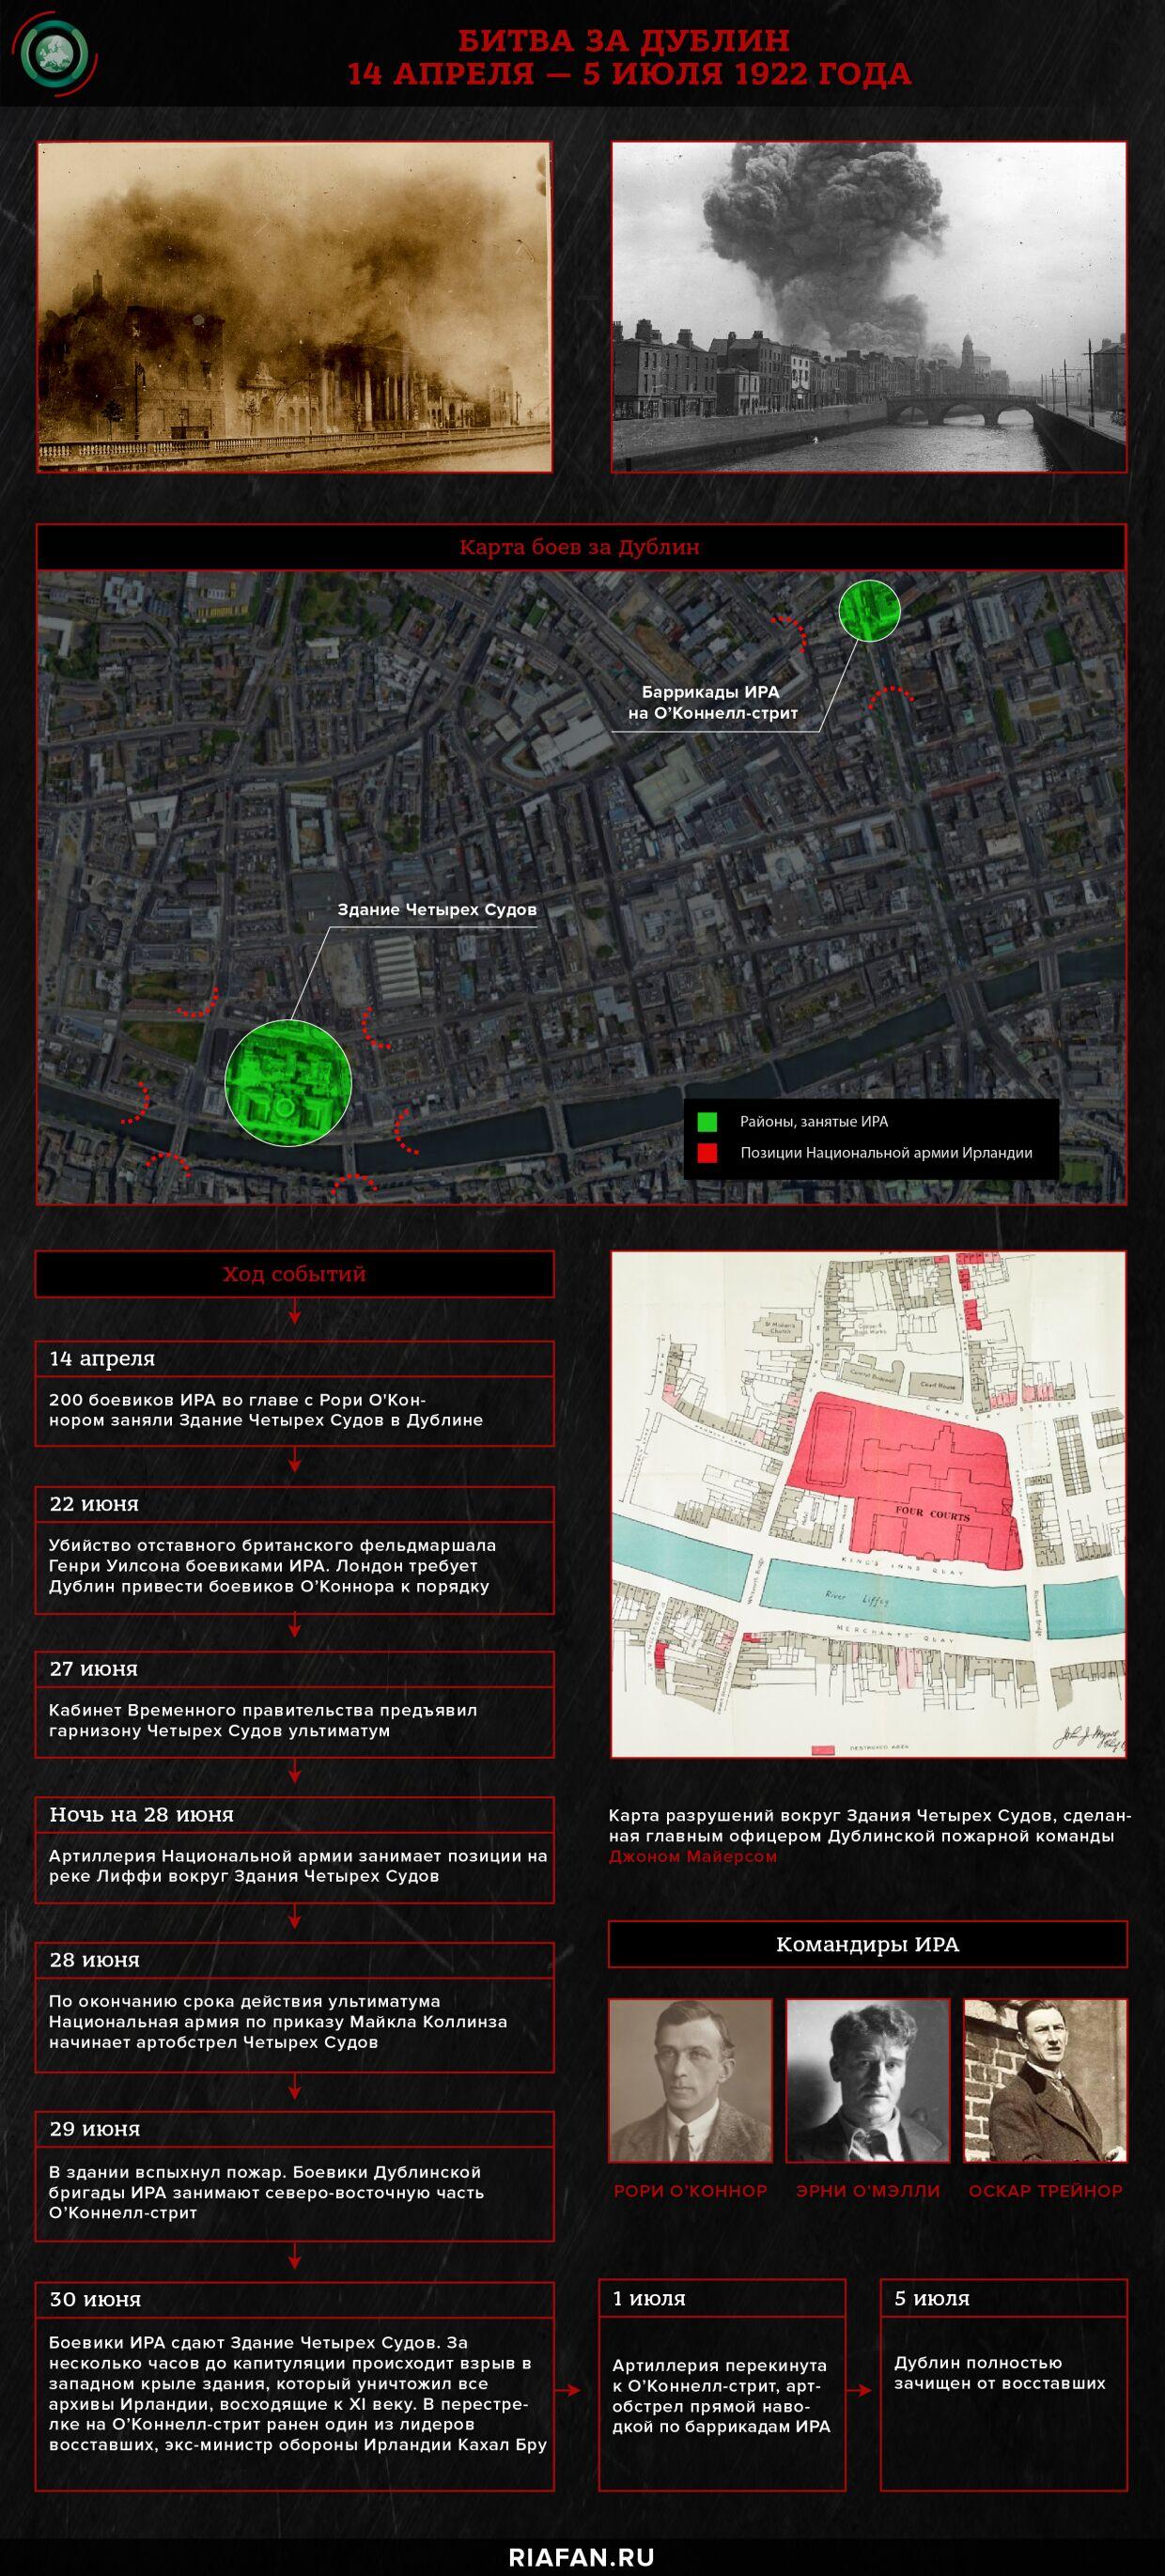 Битва за Дублин 14 апреля - 5 июля 1922 года